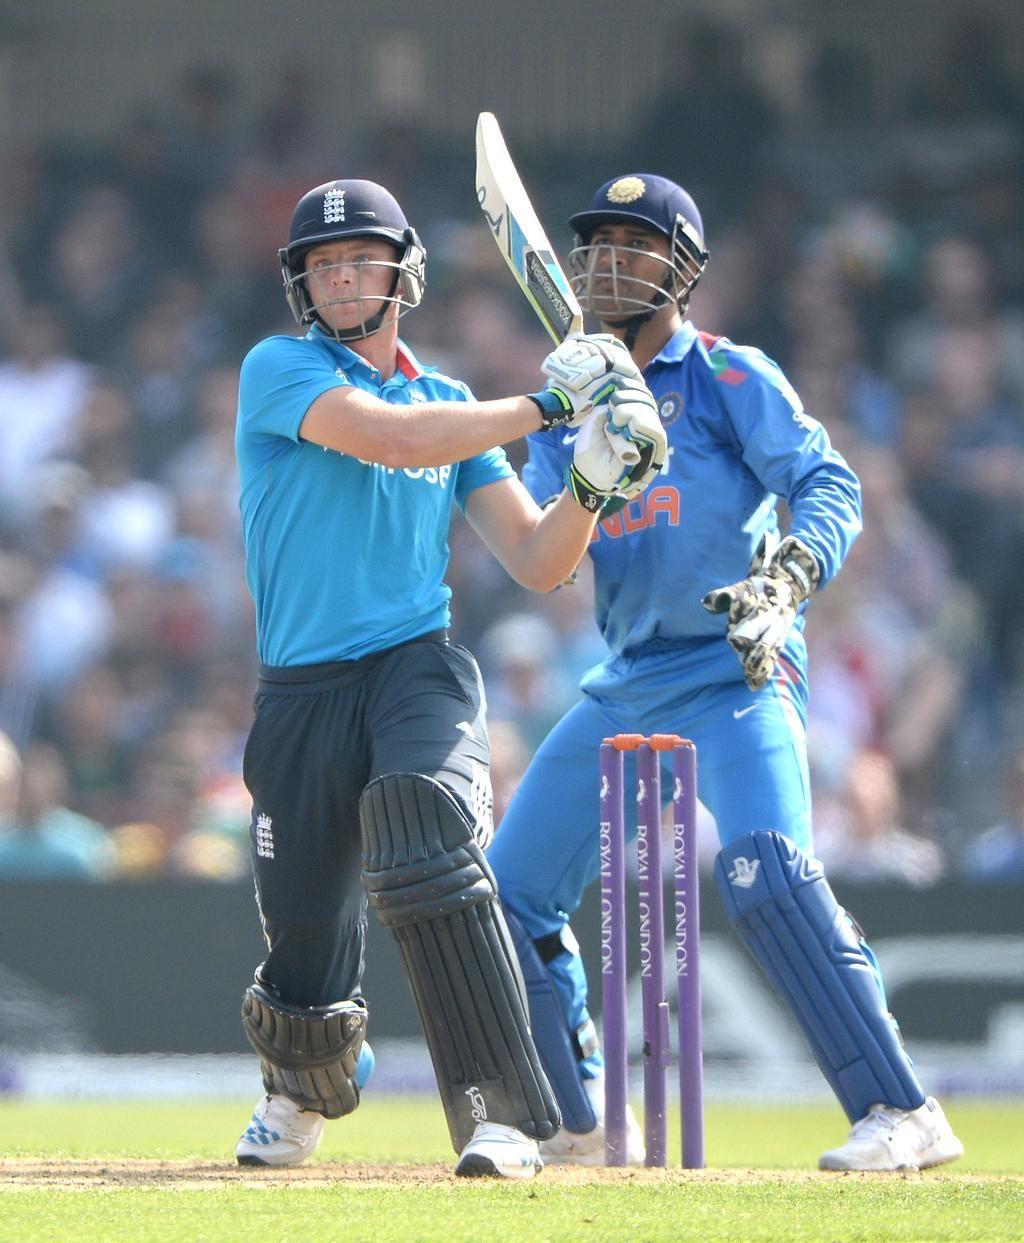 England V India 5th Odi September 5 2014 World Cricket India Photo